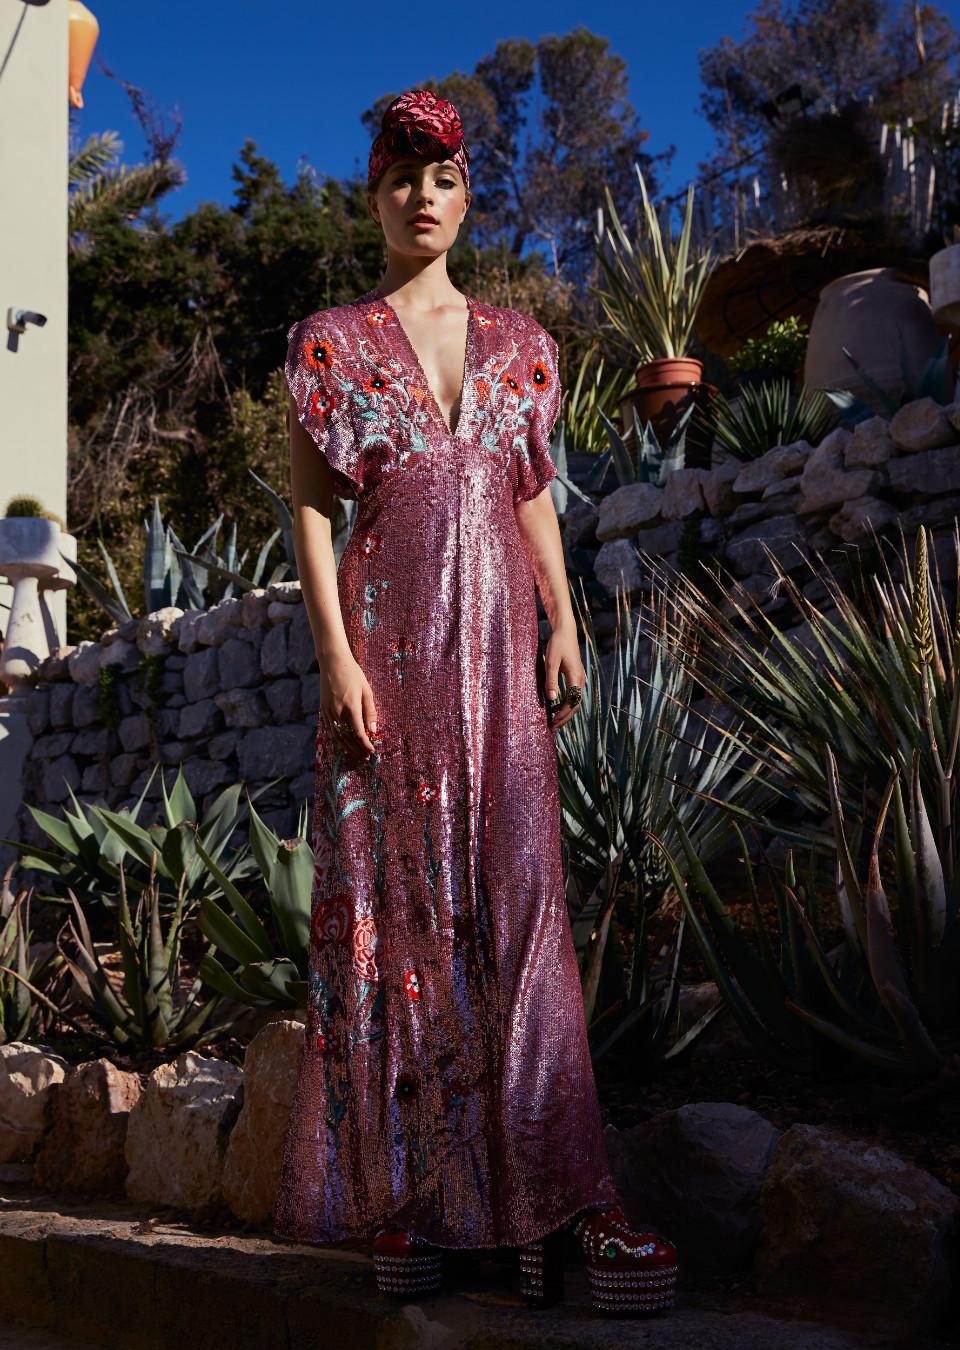 Esti Van Balen Dominique Models Agency Top Pink Next